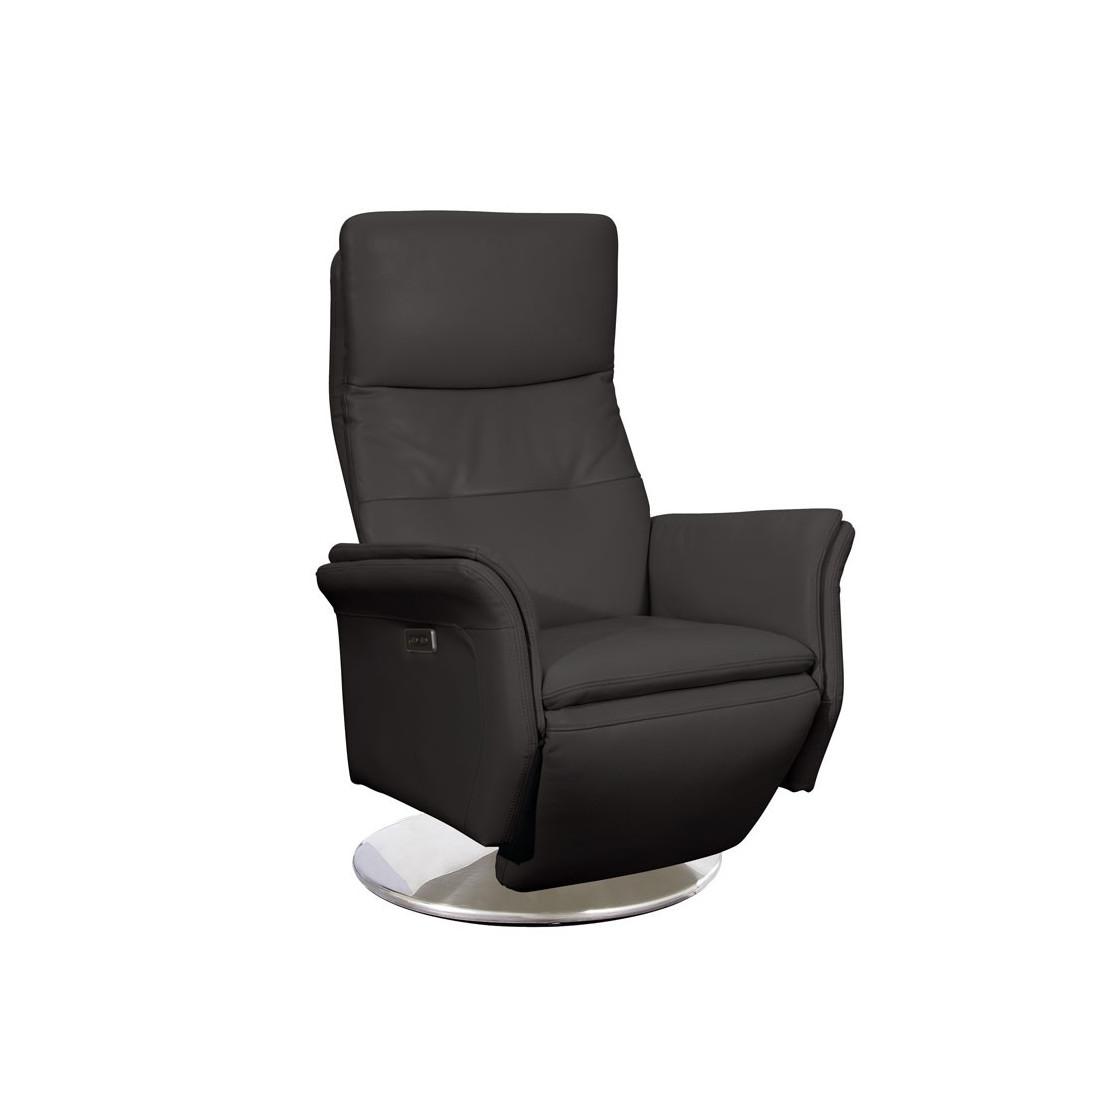 fauteuil de relaxation cuir anthracite flora tousmesmeubles assises. Black Bedroom Furniture Sets. Home Design Ideas